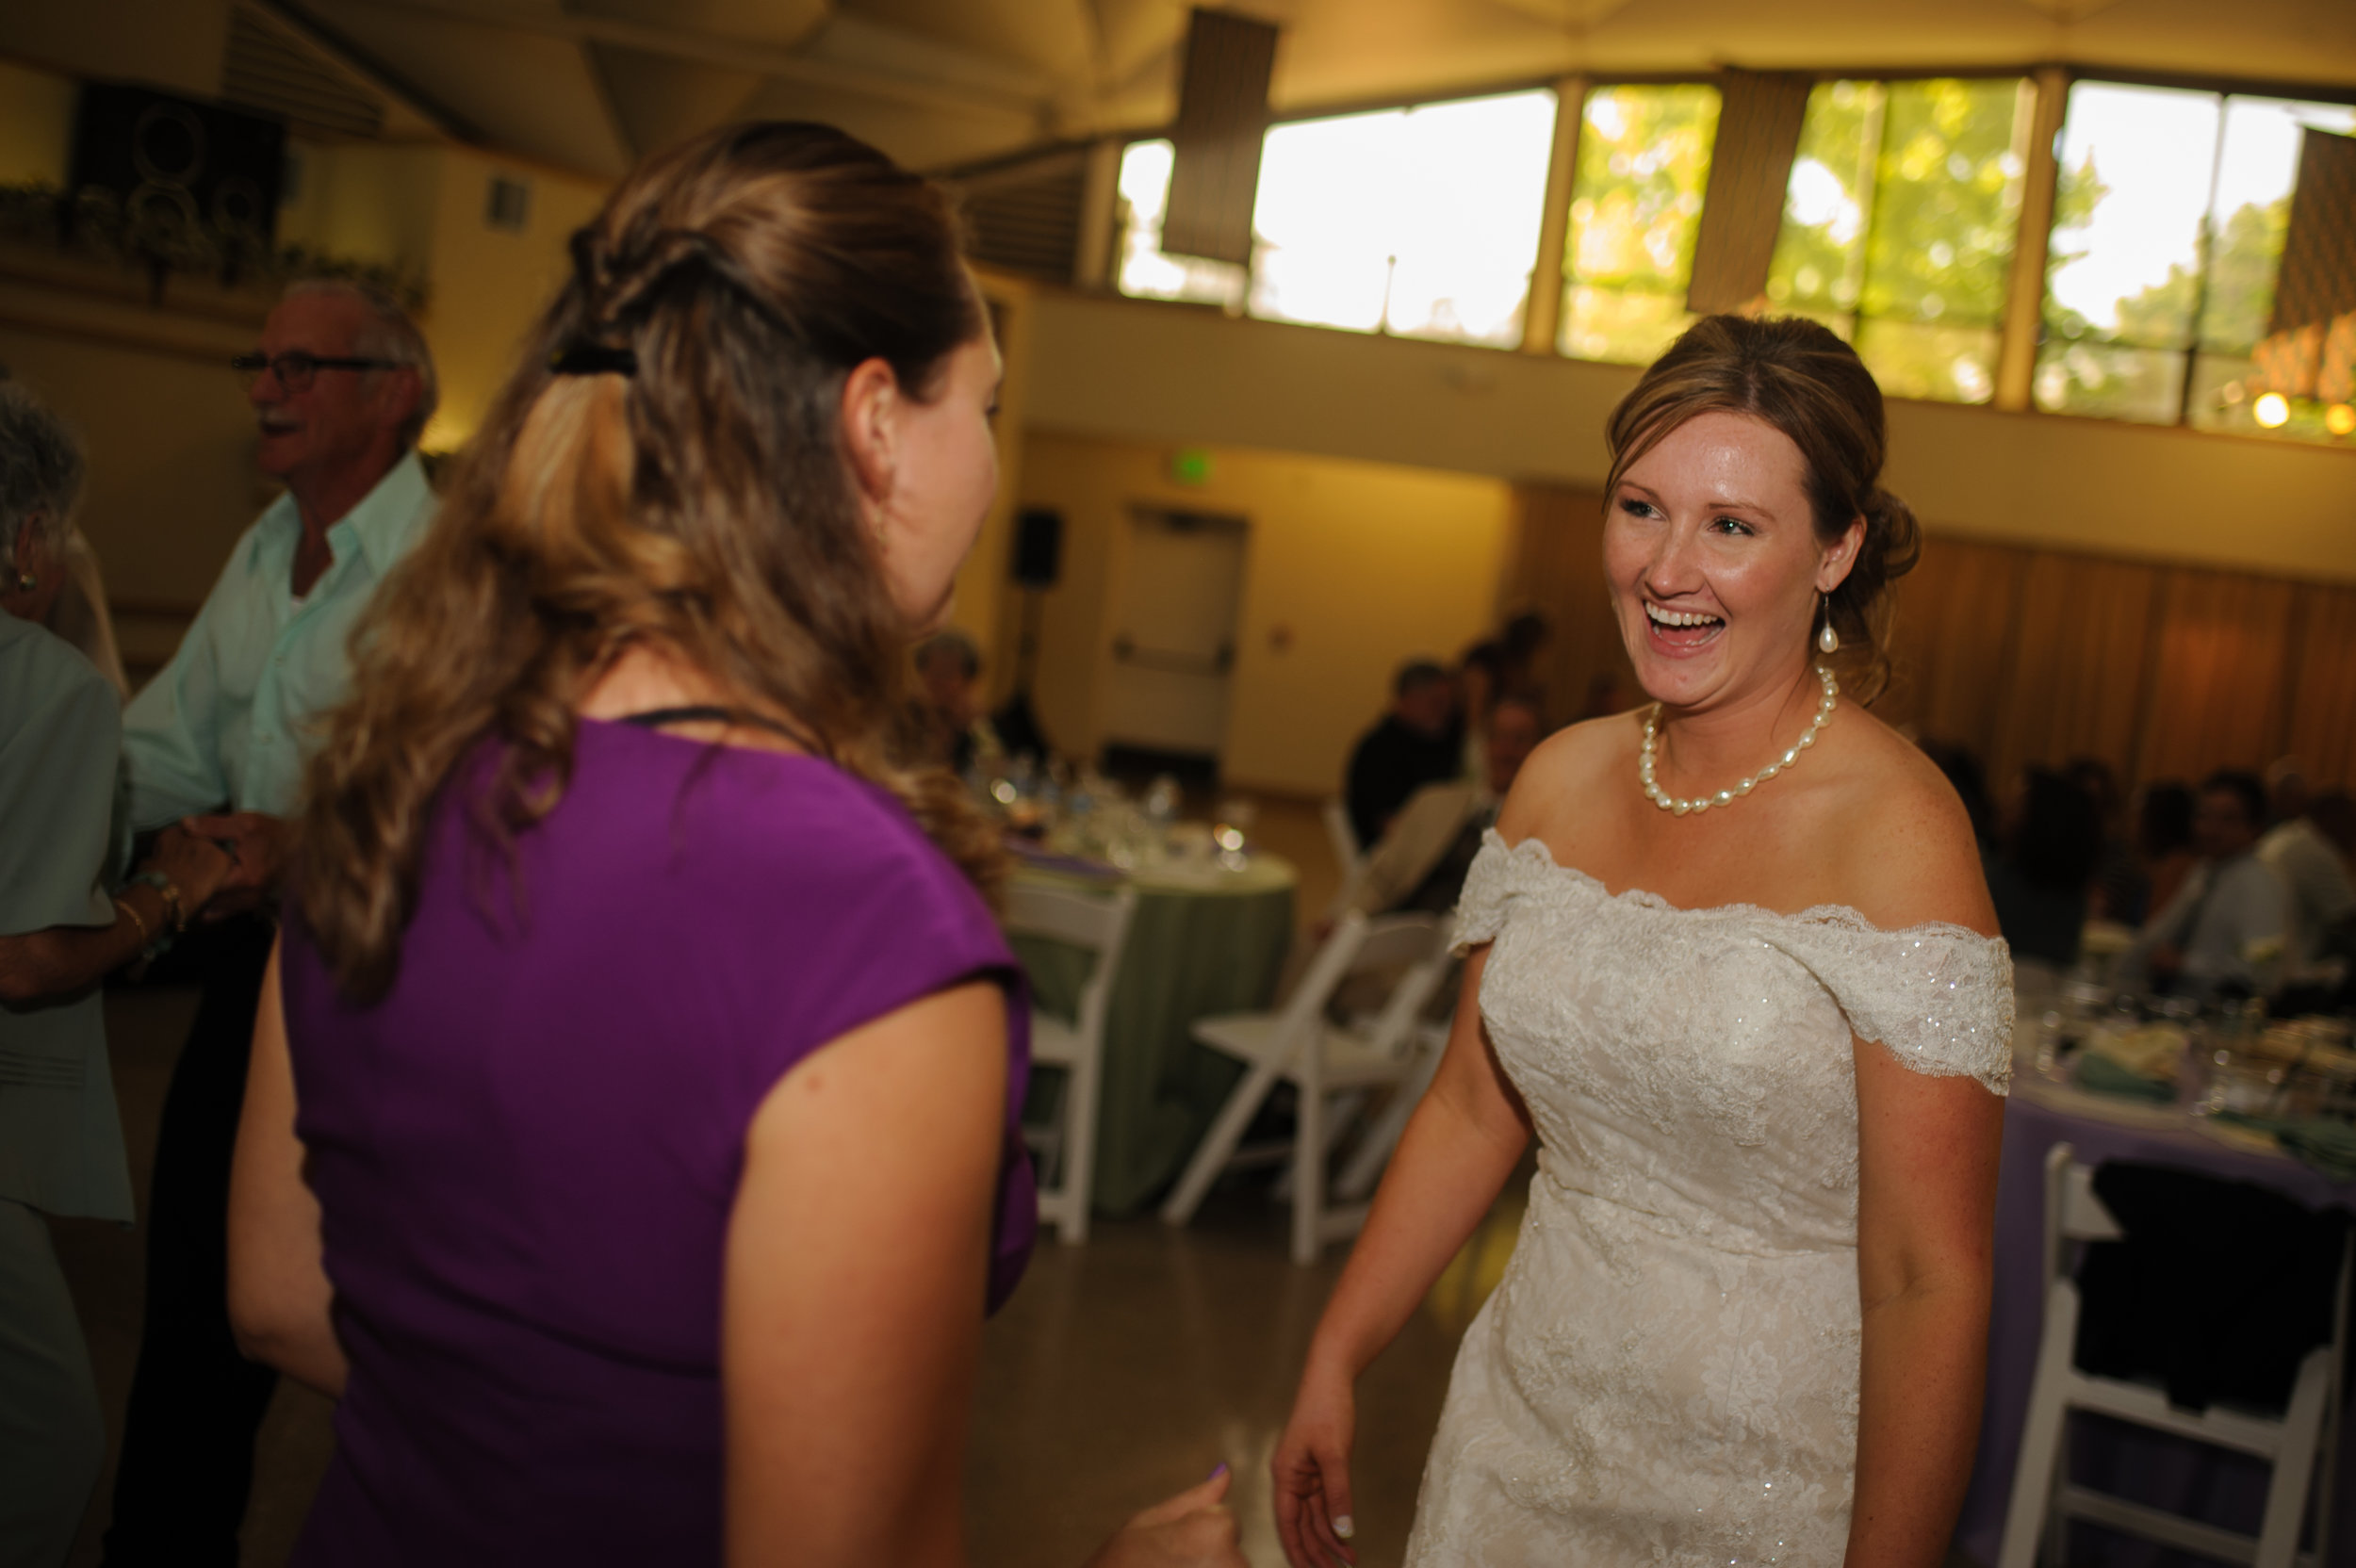 danielle-ross-037-sacramento-wedding-photographer-katherine-nicole-photography.JPG